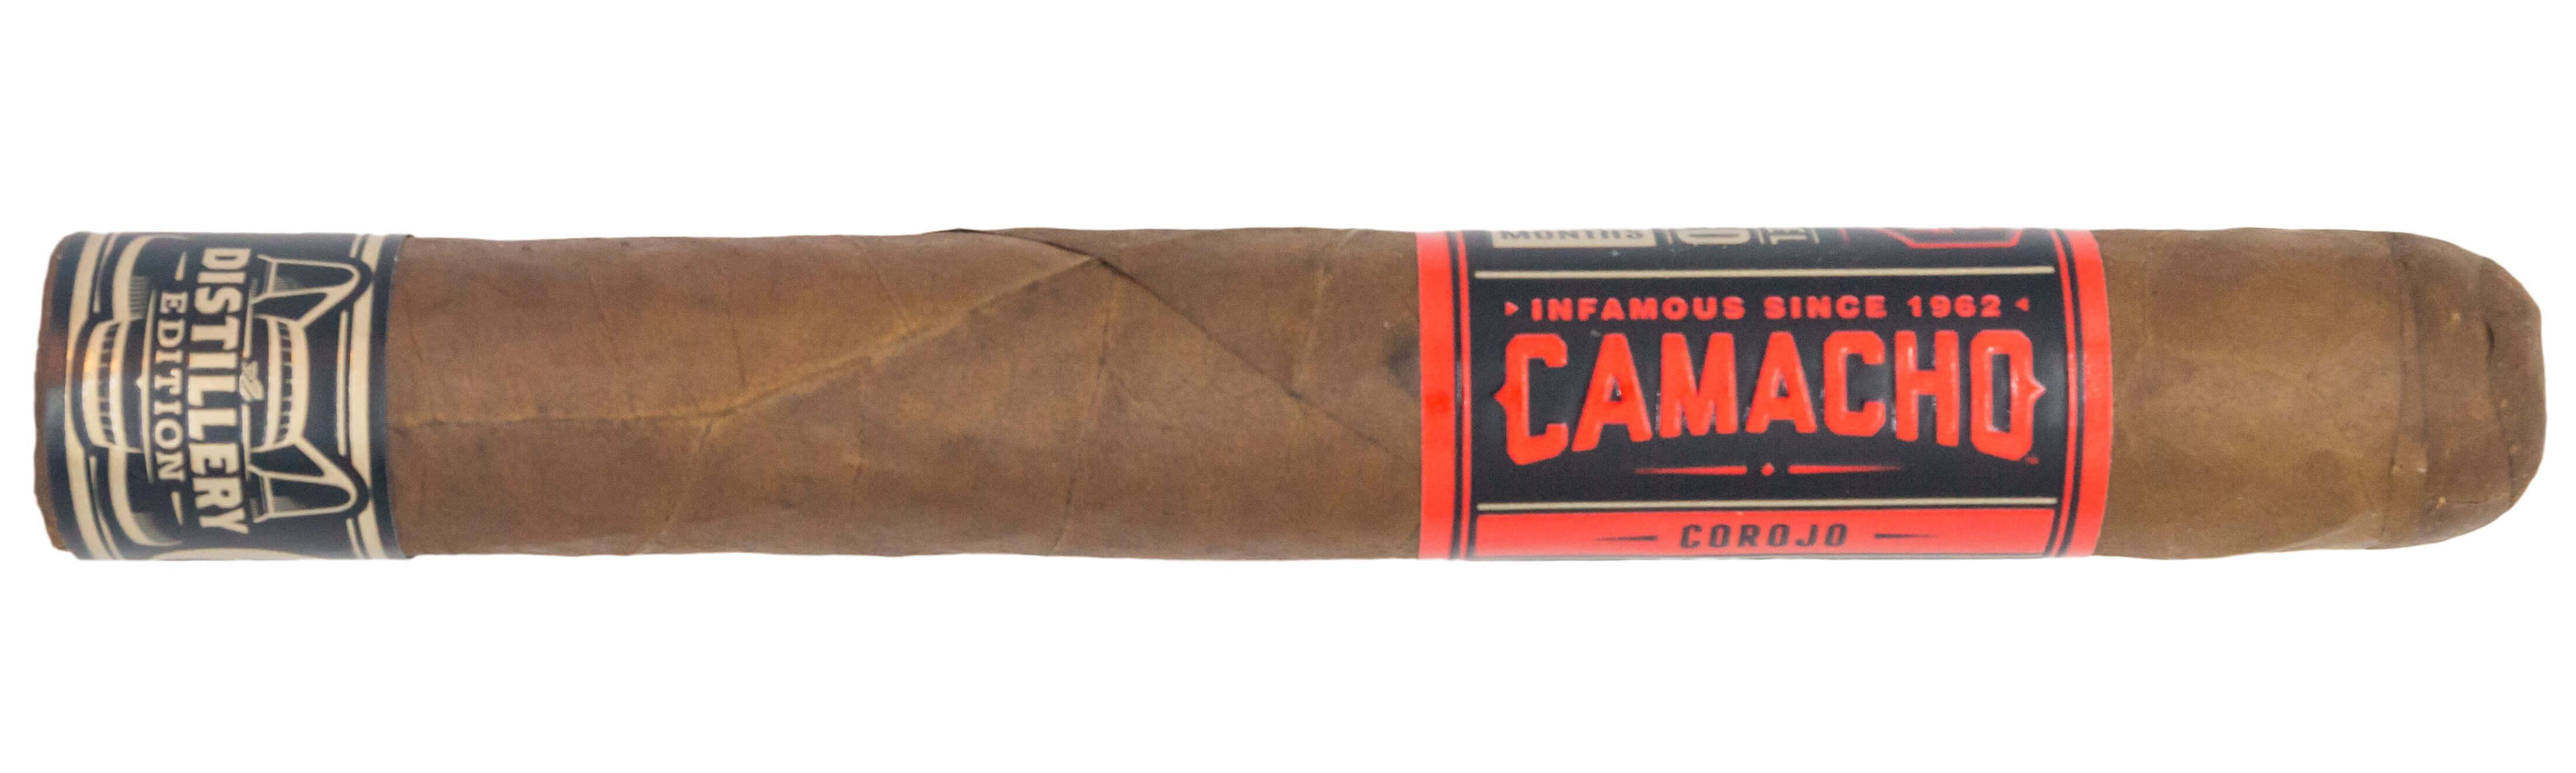 Blind Cigar Review: Camacho | Distillery Edition Corojo Toro